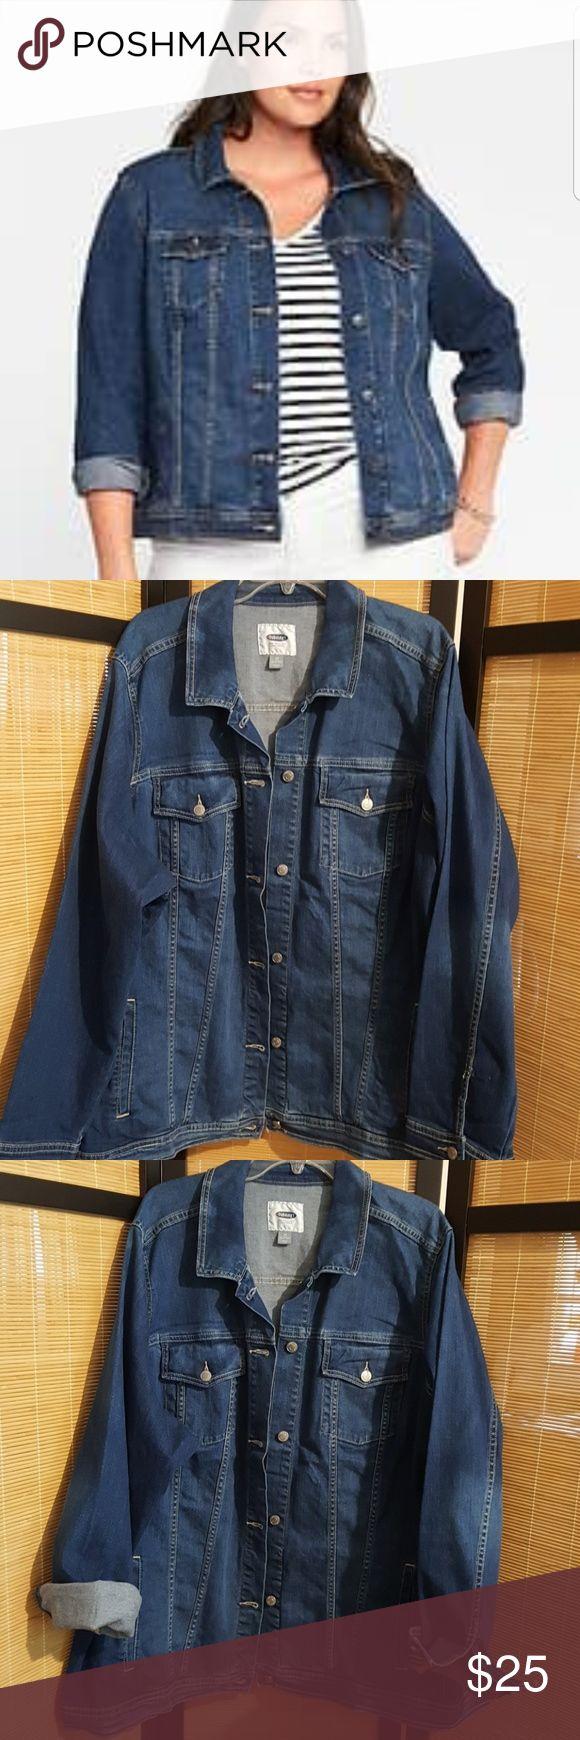 Old Navy denim jacket *NEW* Denim jacket by Old Navy NWT,no trades Old Navy Jackets & Coats Jean Jackets